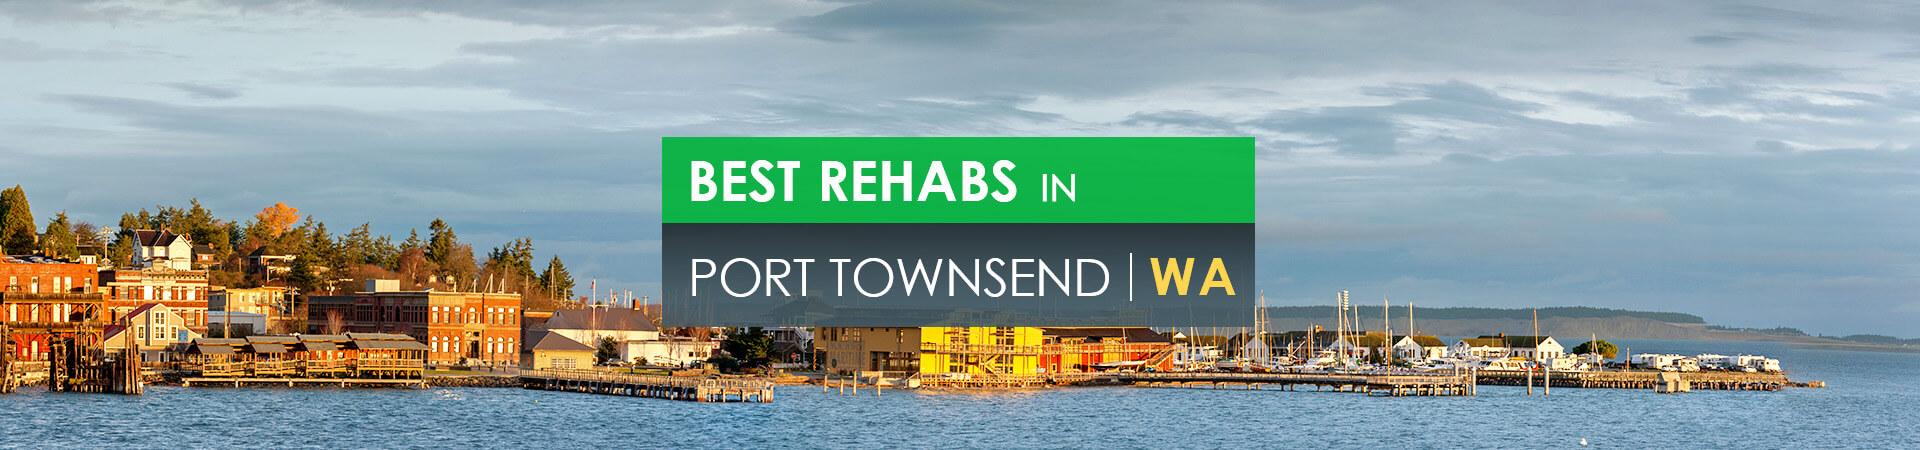 Best rehabs in Port Townsend, WA